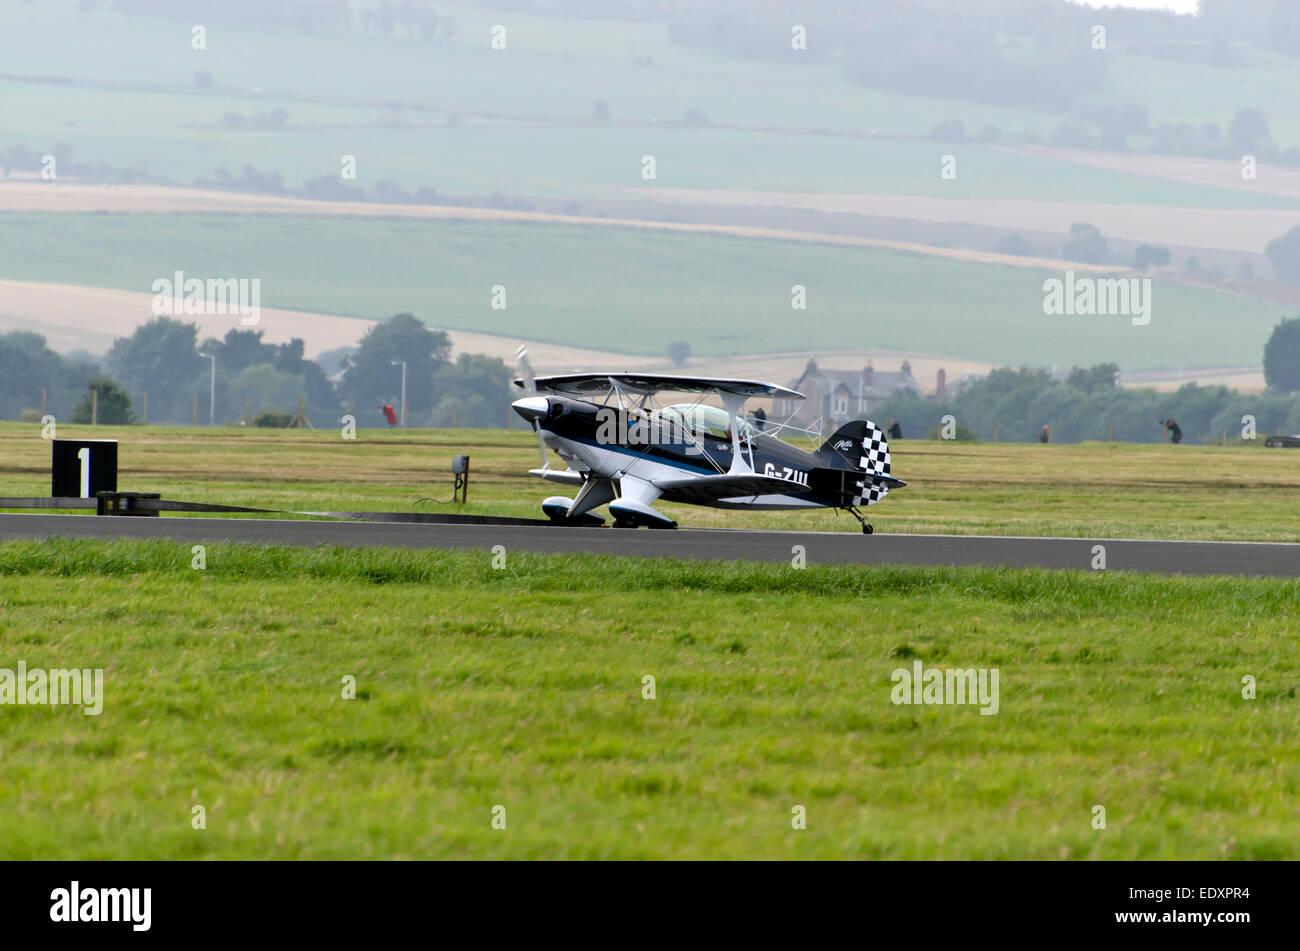 Member of the Wildcat Acrobats display team landing a Pitts S-2 bi-plane at Leuchars Air Show, Scotland, 2013. - Stock Image